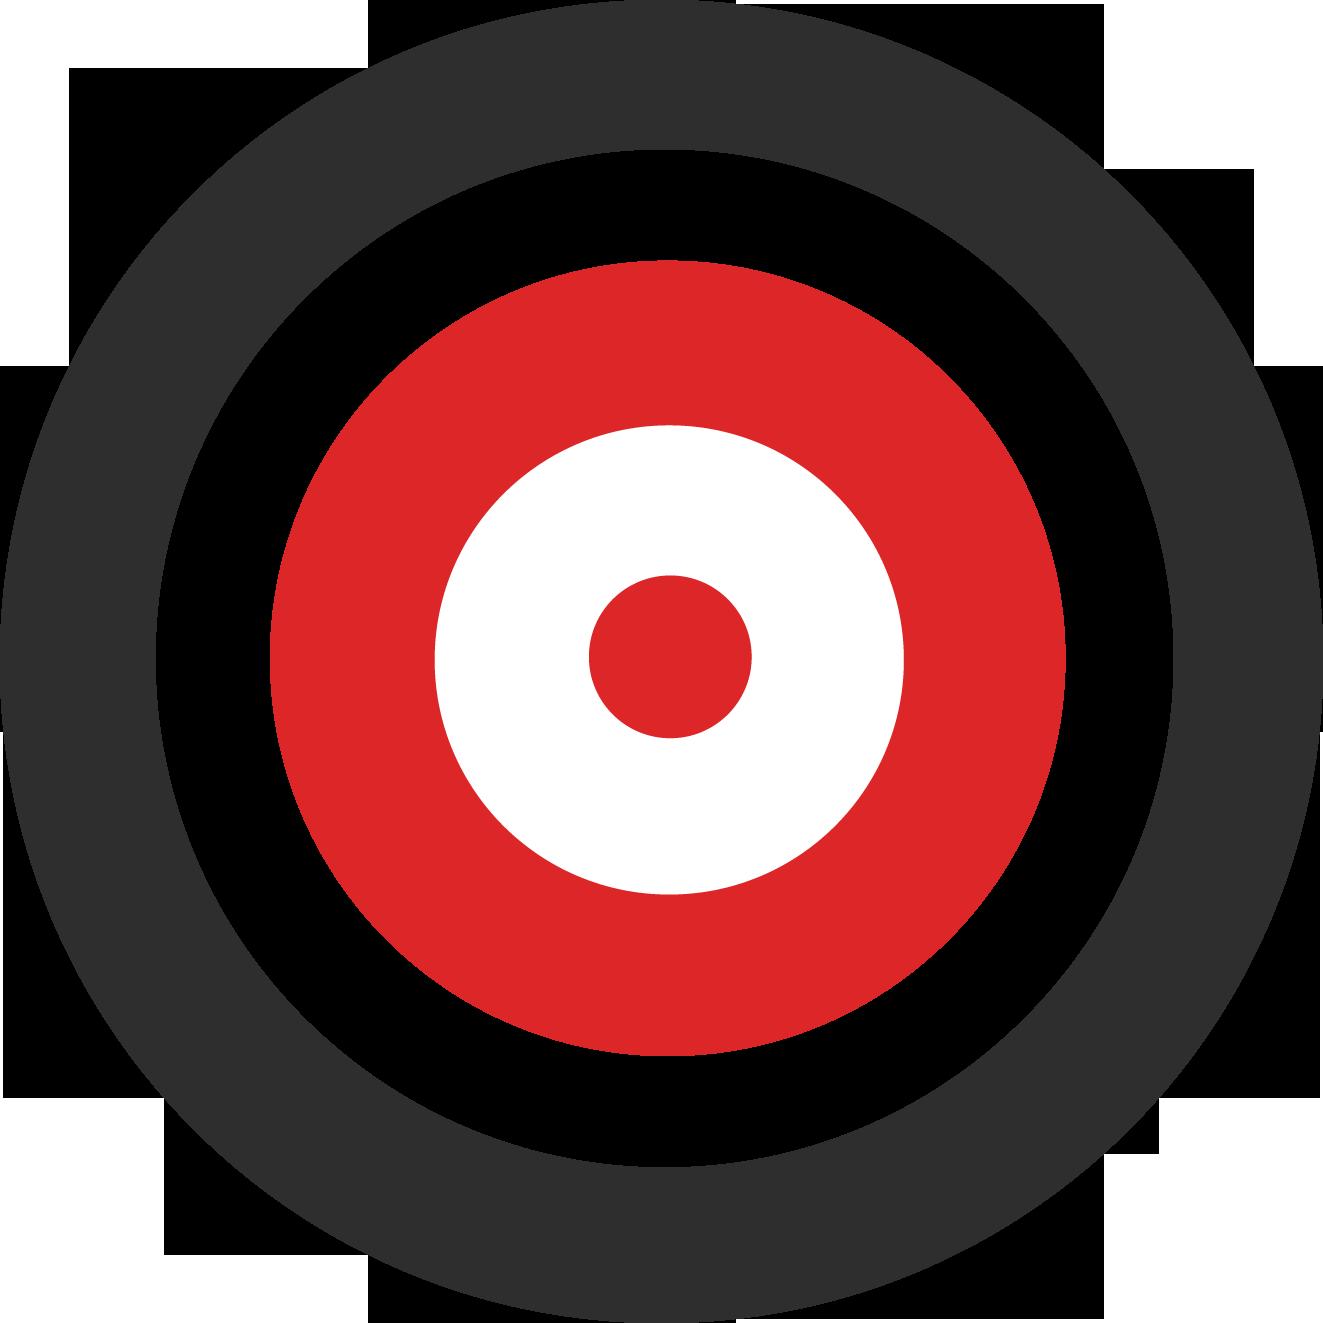 freeuse download Target PNG